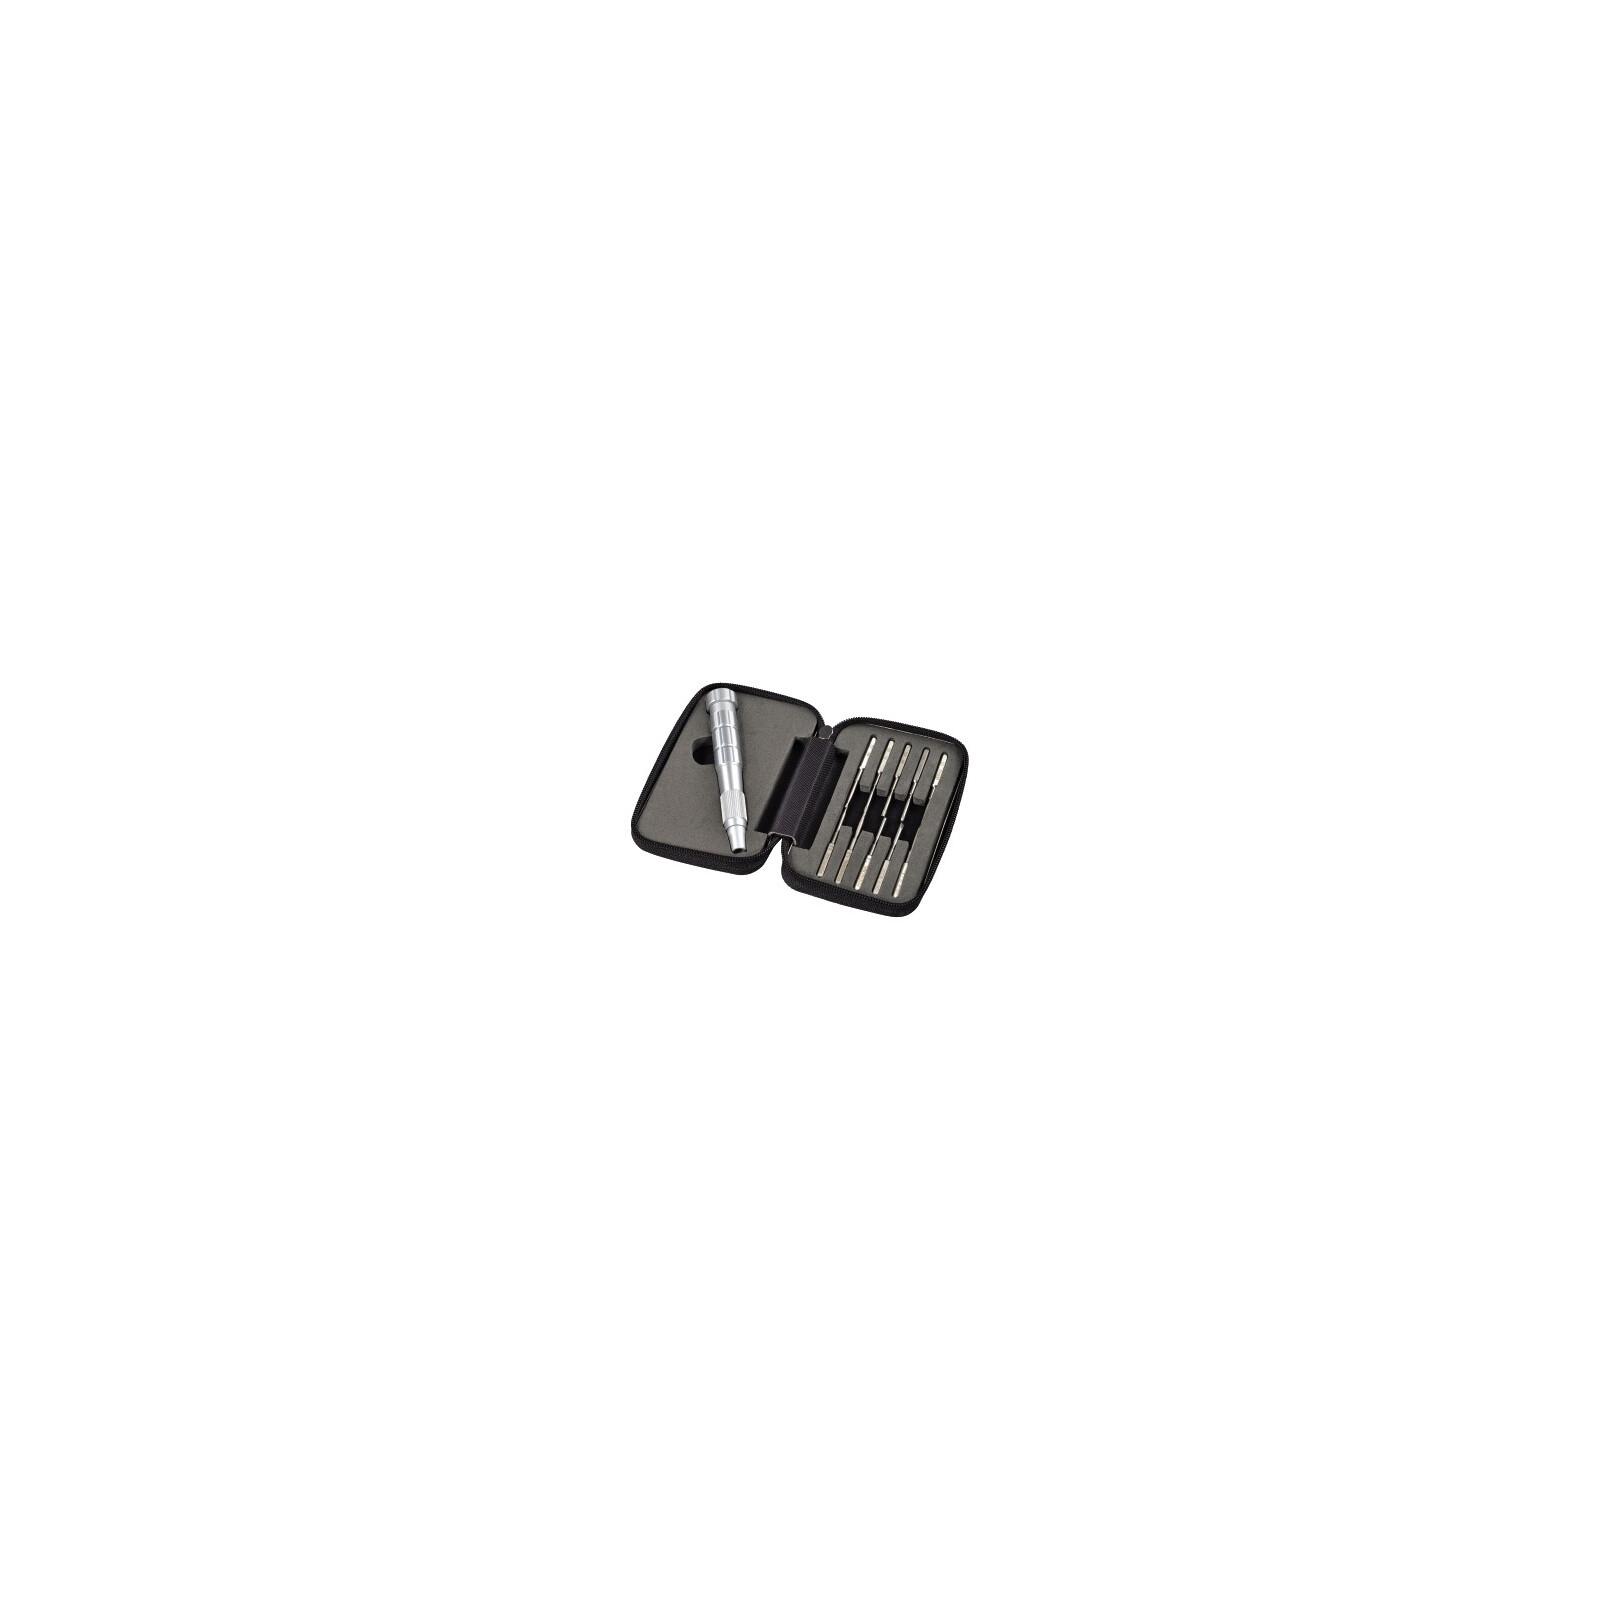 Hama 53052 Universal-Schraubendreher-Set